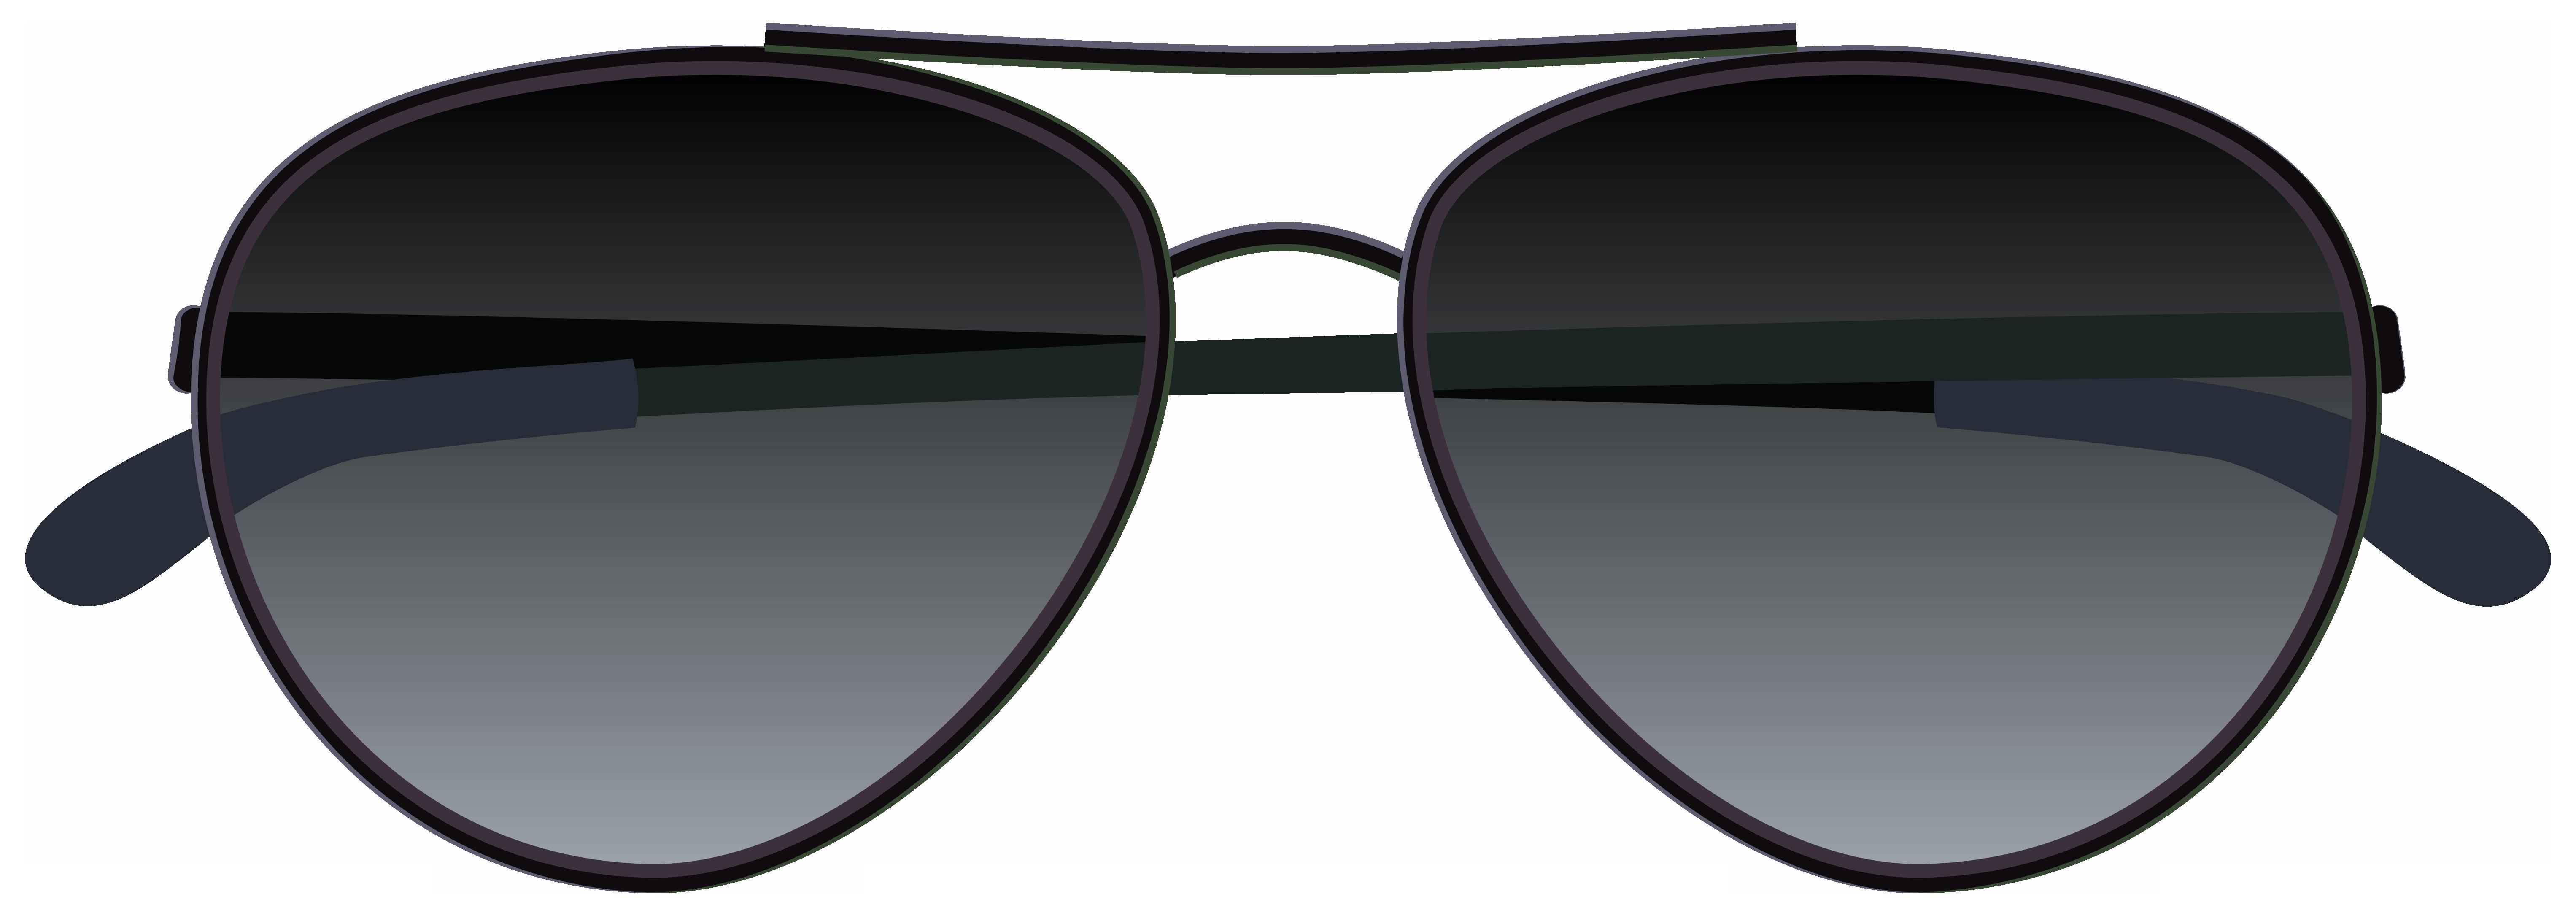 Sunglasses Transparent Background SVG Clip arts